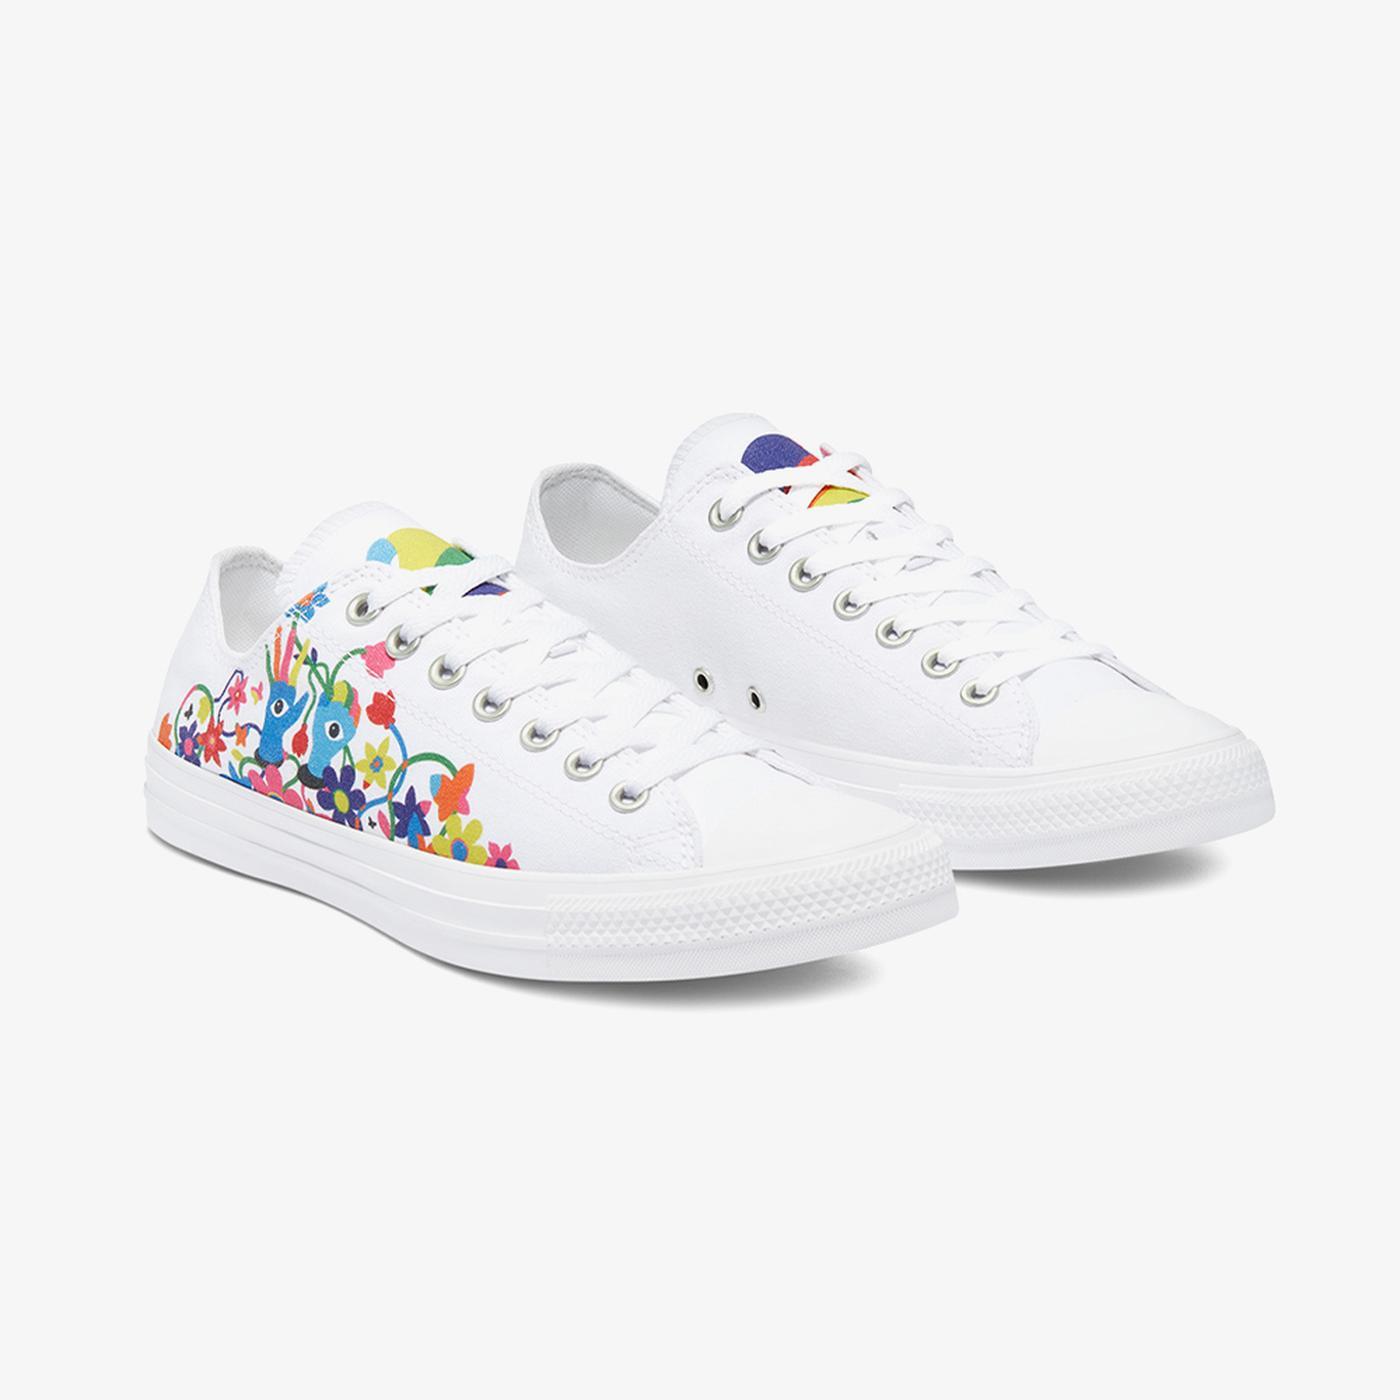 Converse Chuck Taylor All Star Pride Ox Kadın Beyaz Sneaker